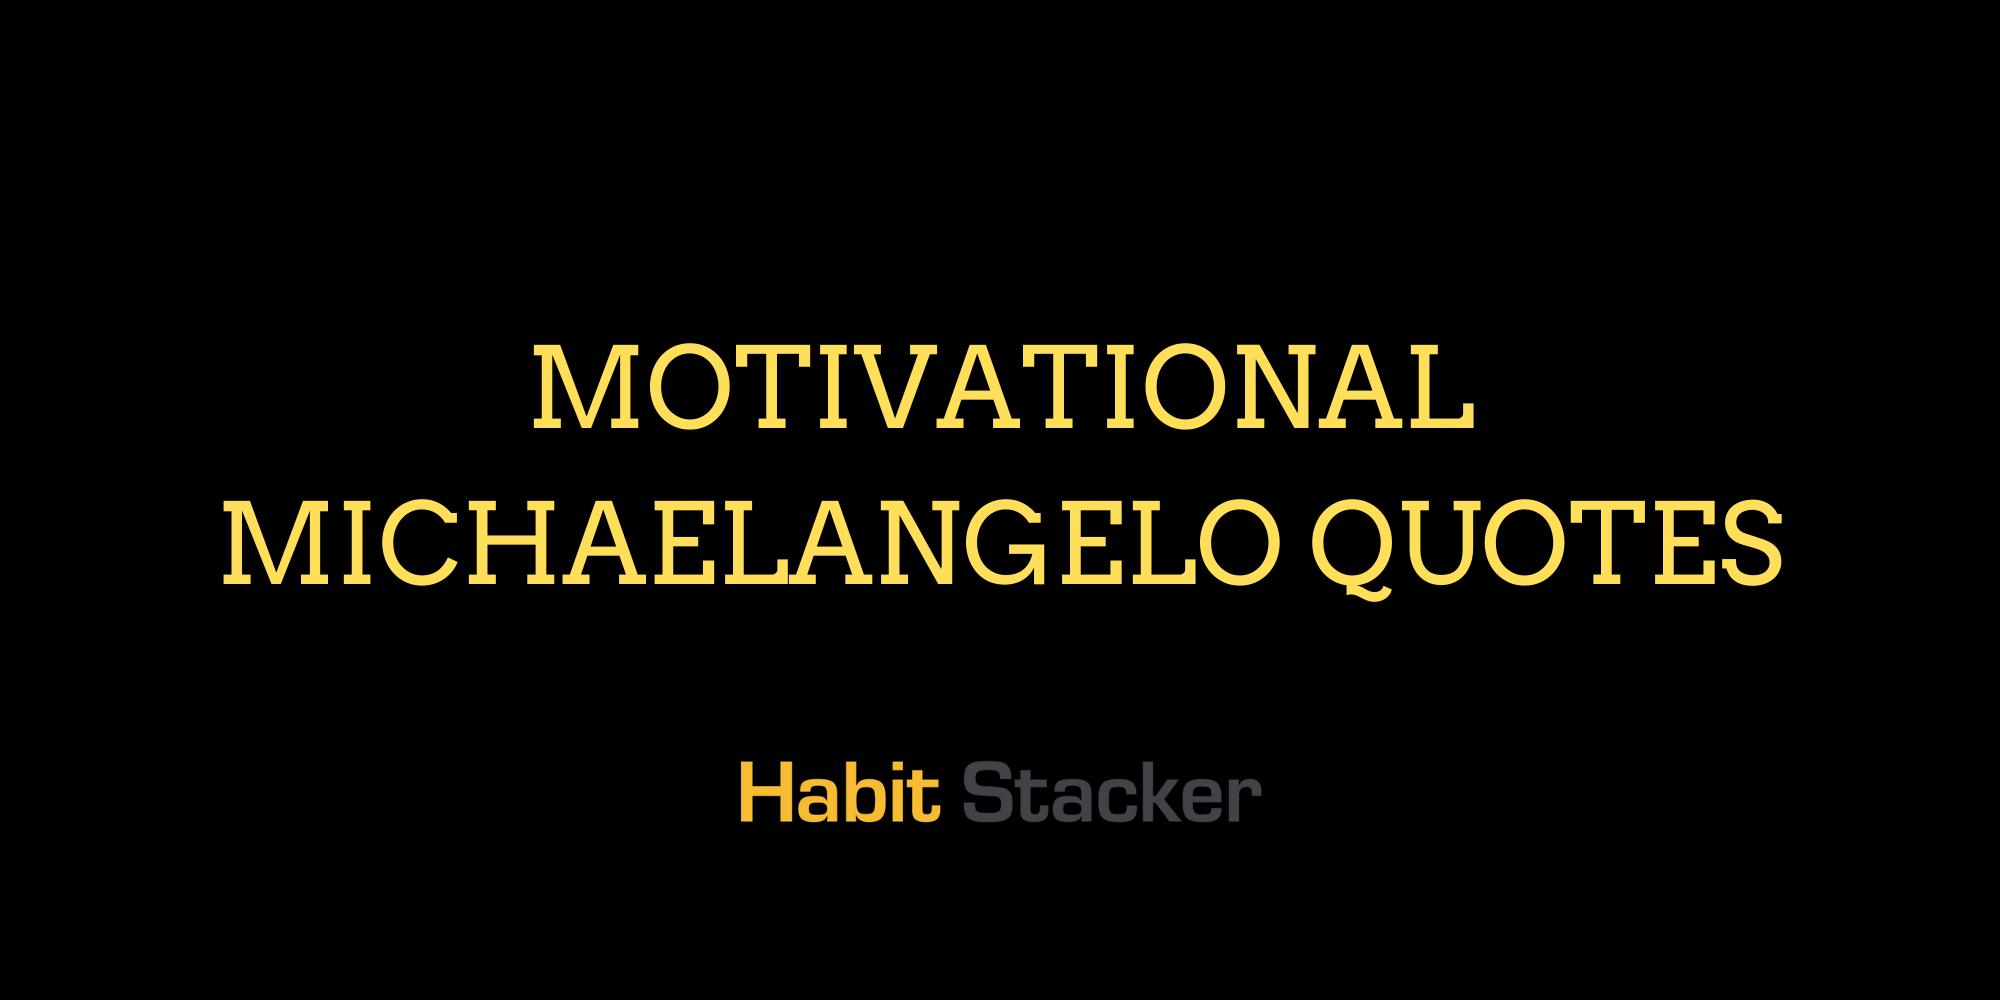 Motivational Michaelangelo Quotes